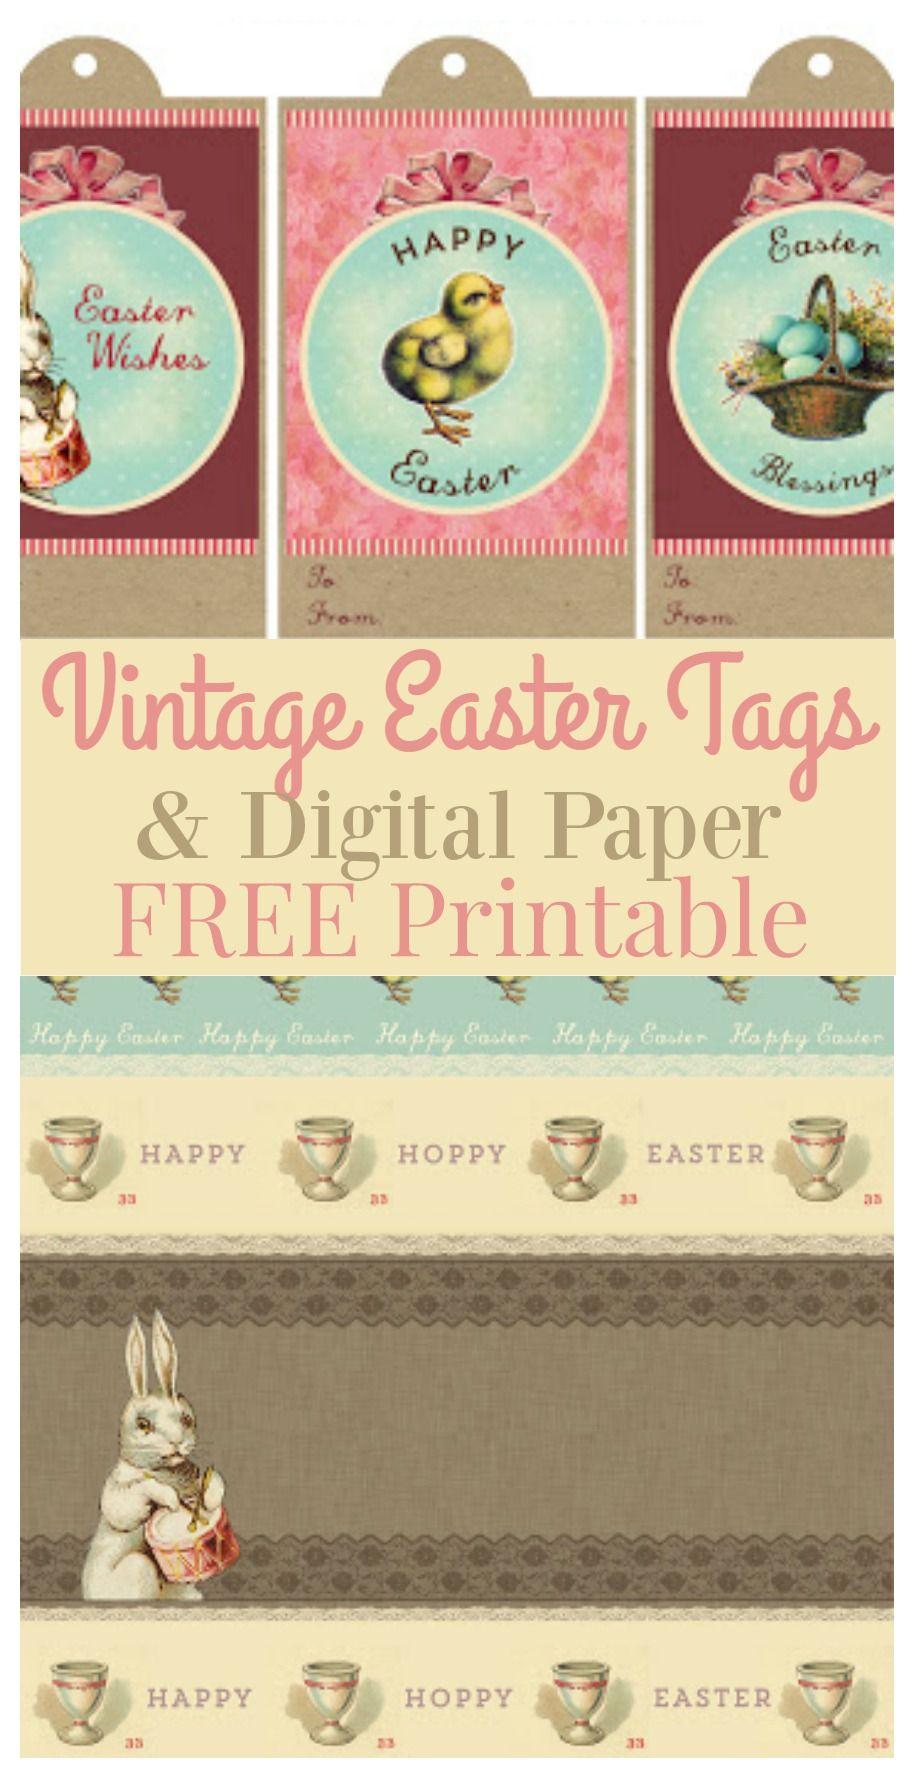 Printable Vintage Easter Gift Tags & Digital Paper | Easter - Free Printable Vintage Easter Images